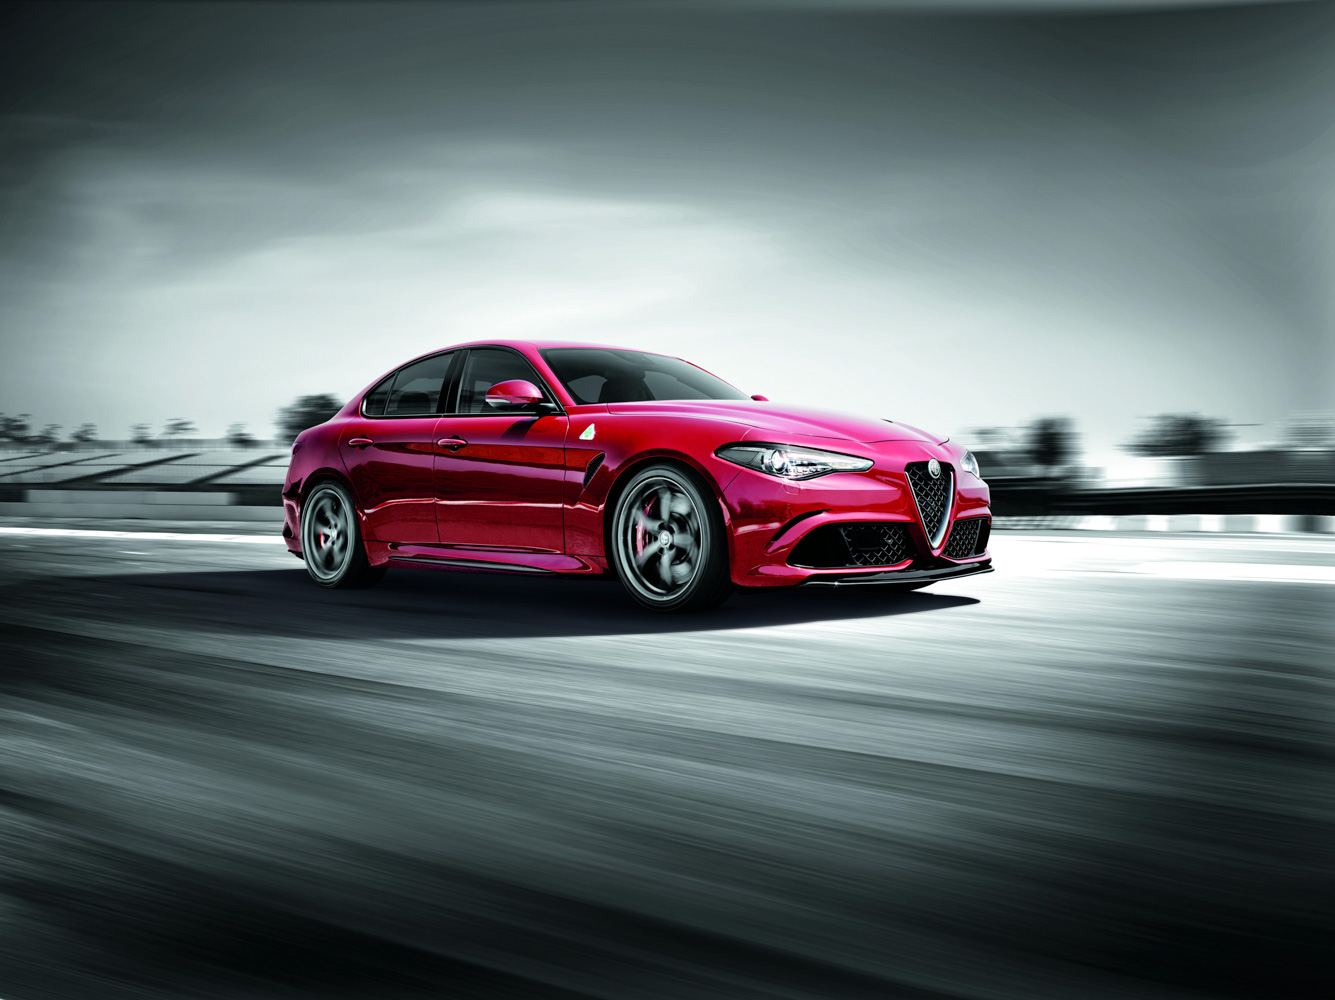 Alfa_Romeo_Giulia_012.jpg